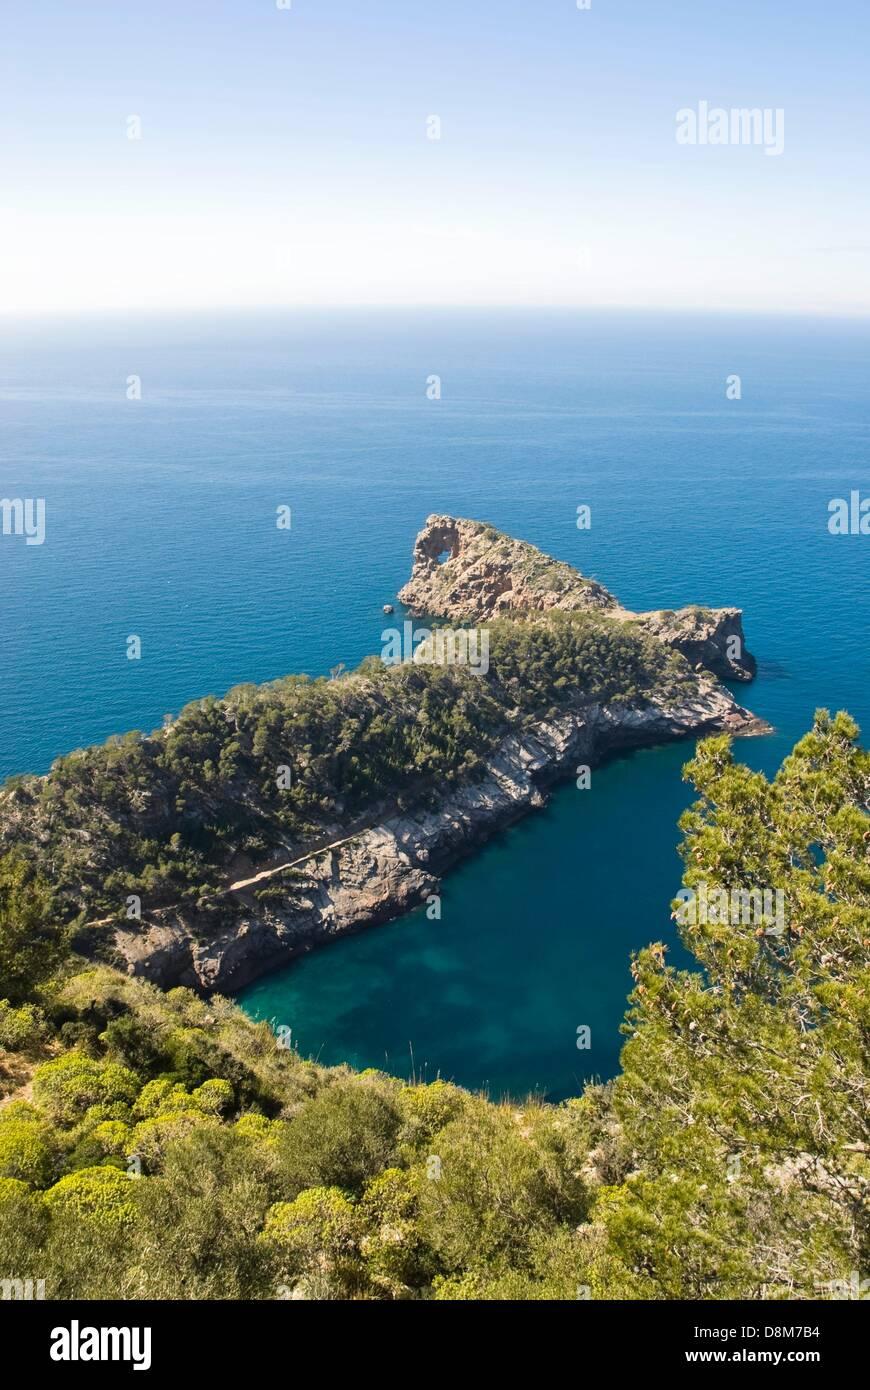 Coast landscape near Valdemossa, Mallorca - Stock Image